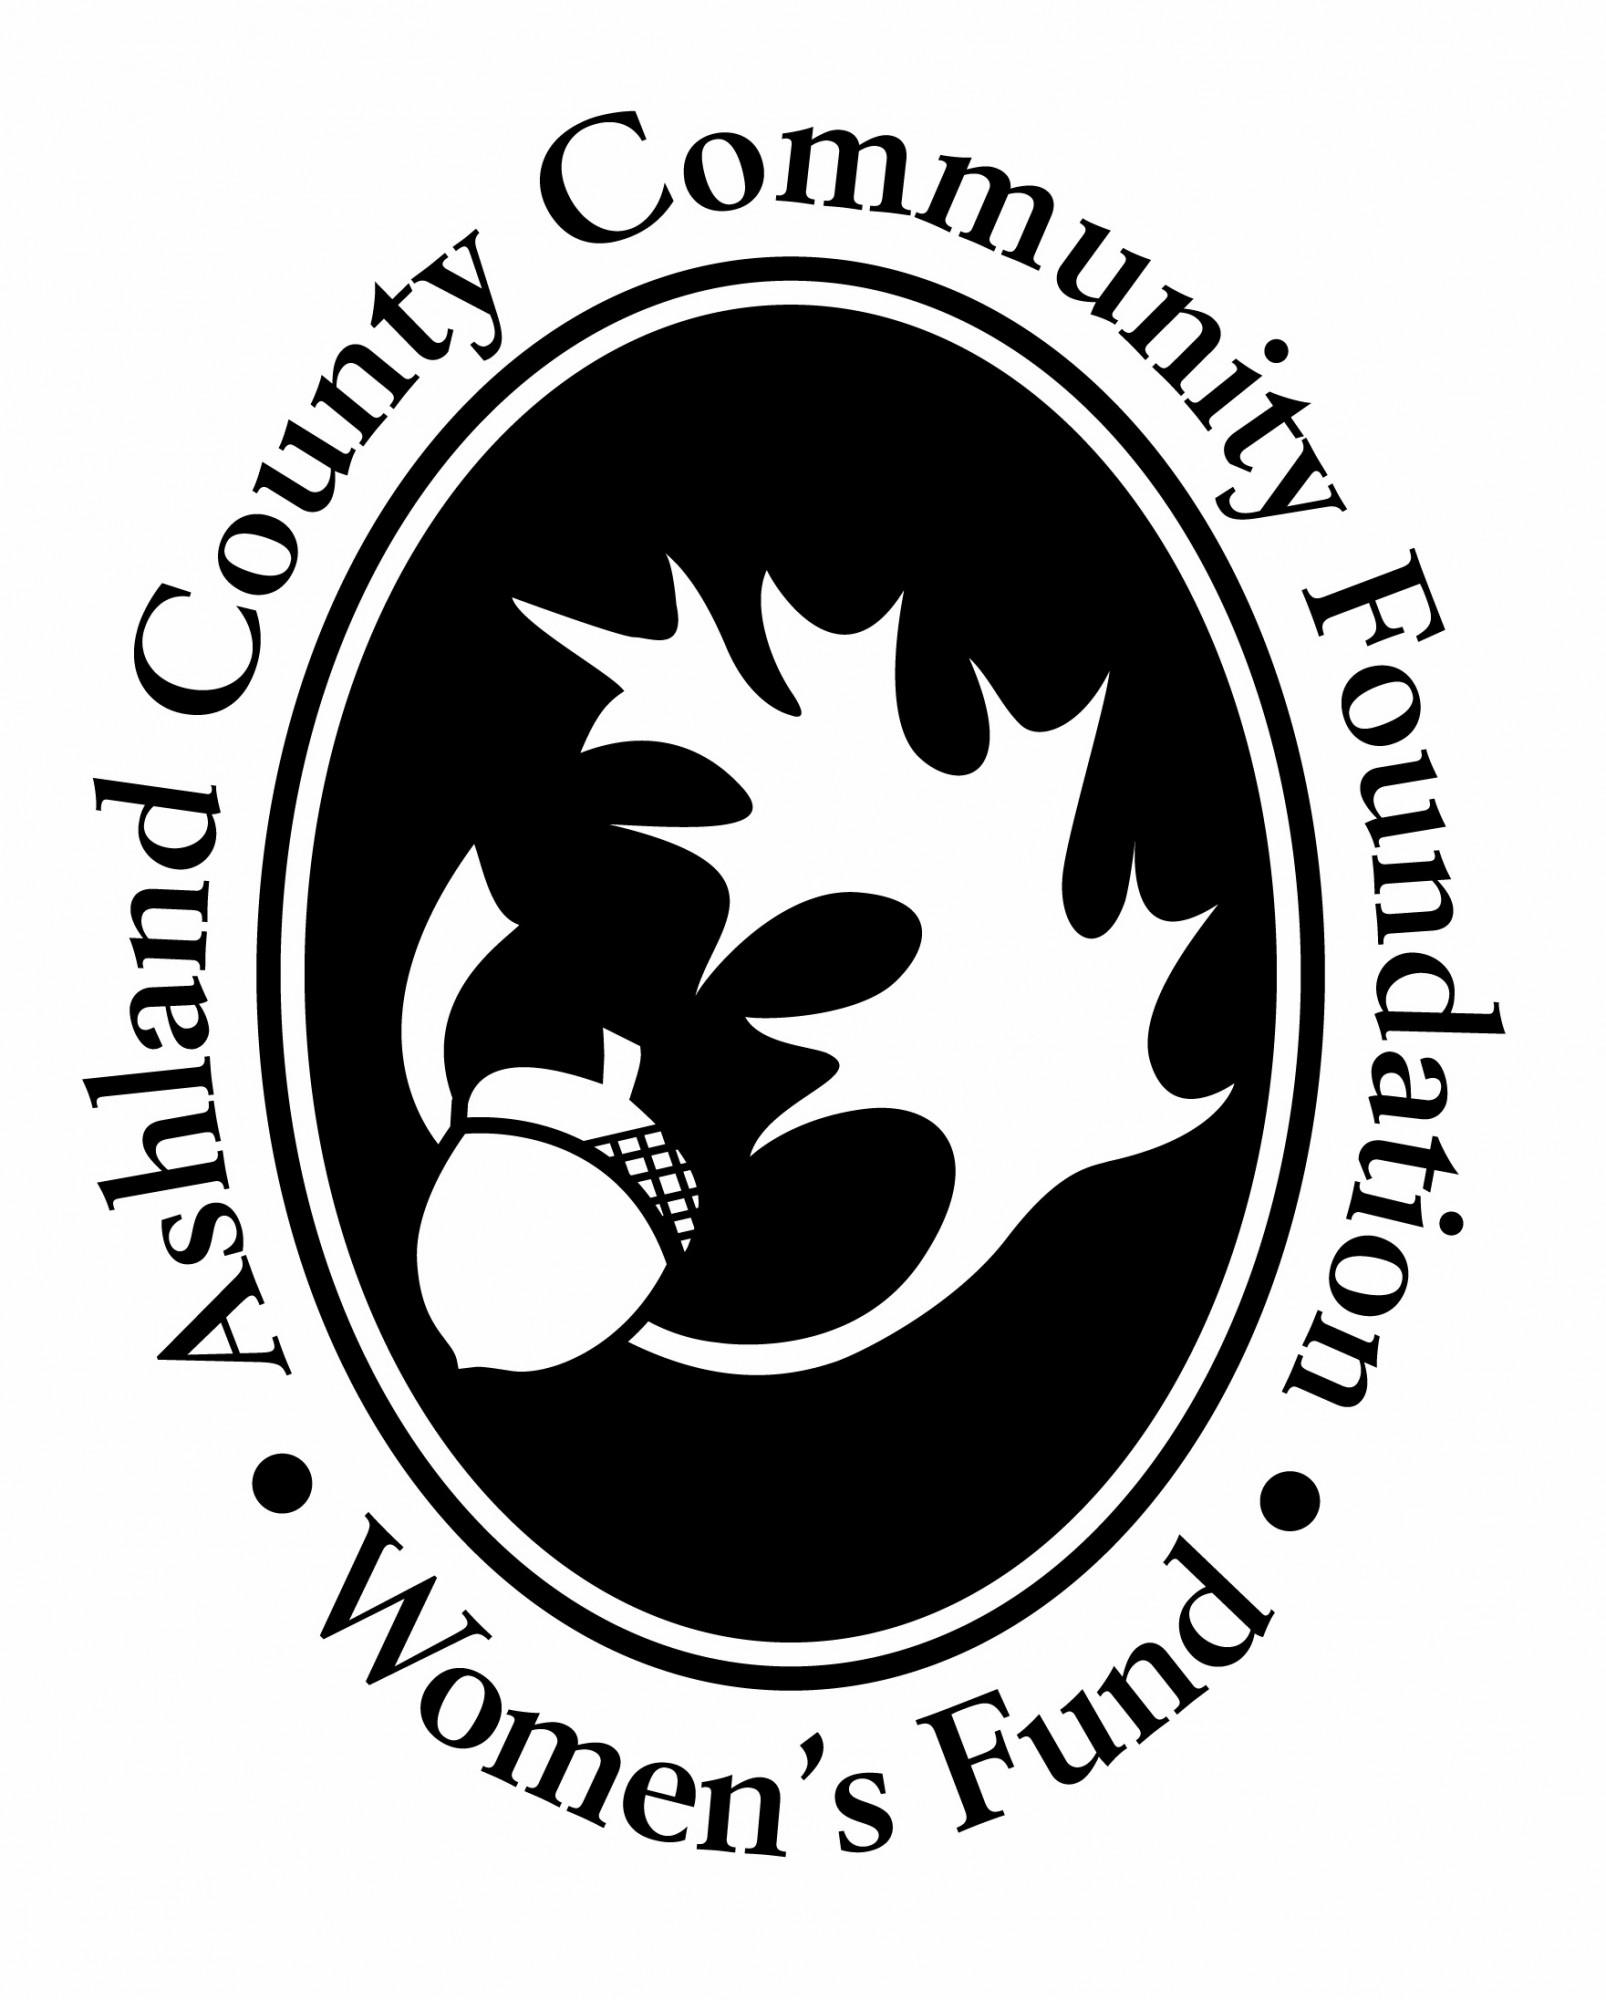 Associated Charities of Ashland County